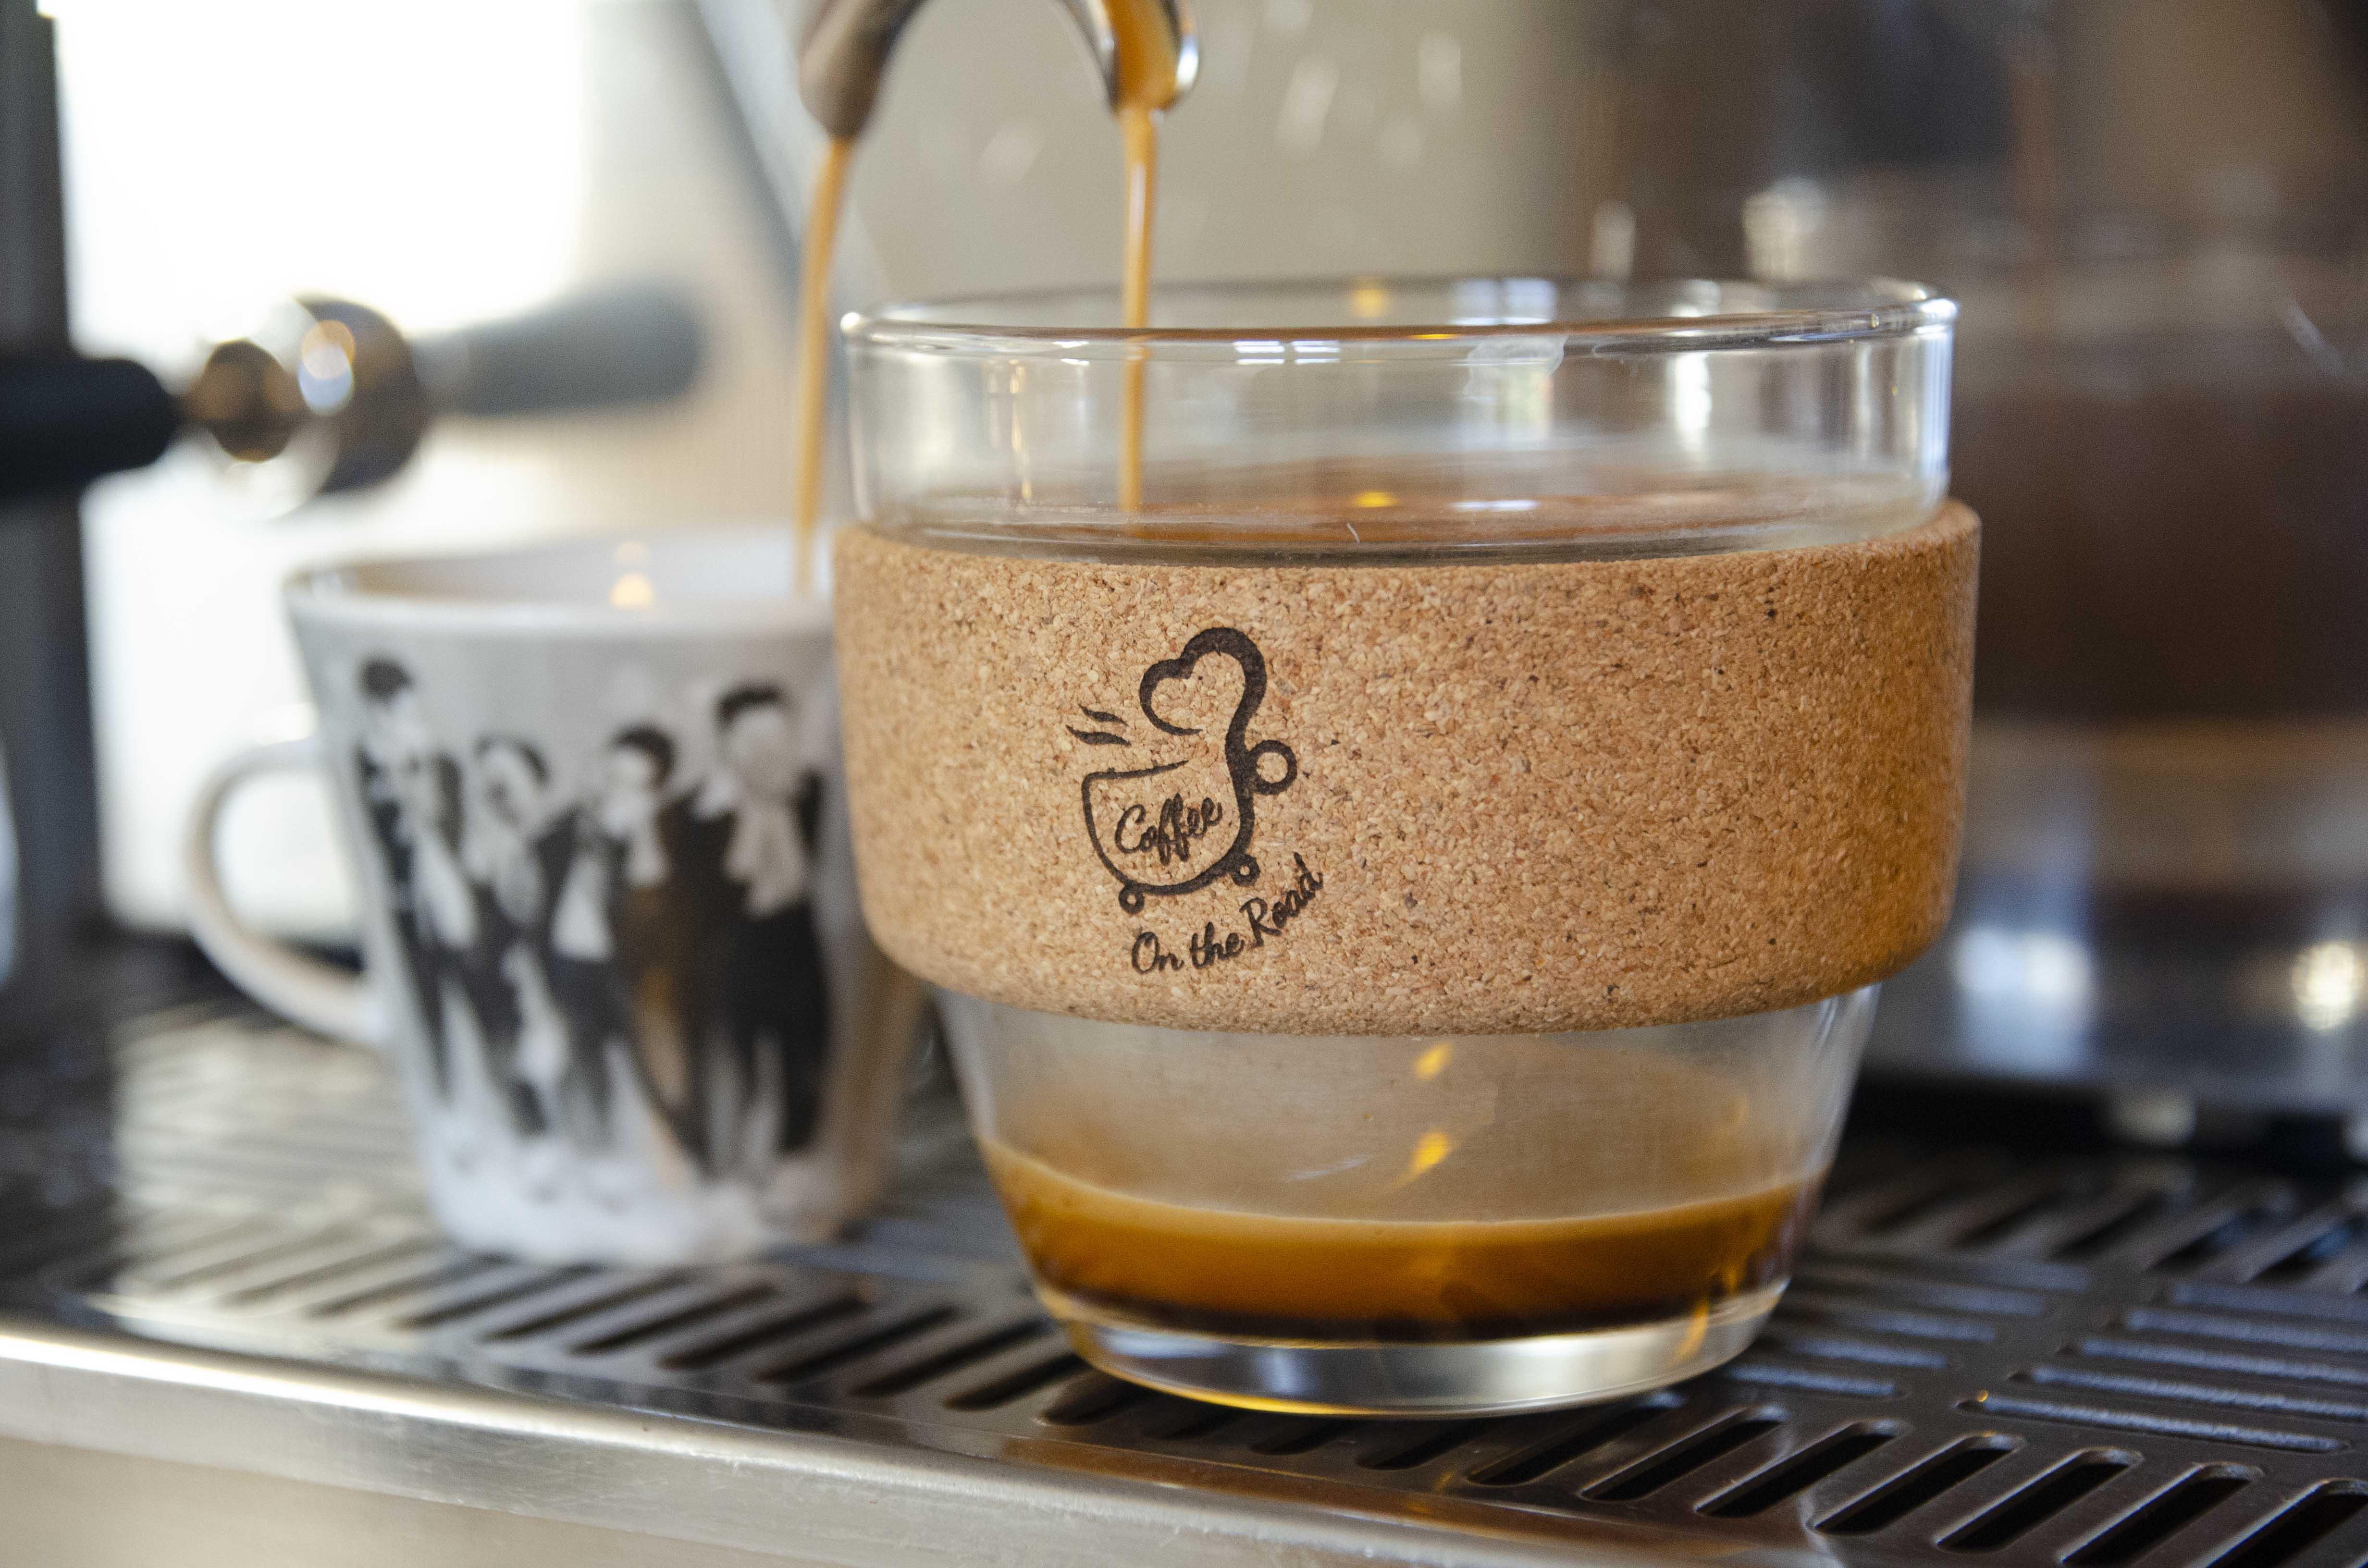 keep cup otr espresso hudobnici salka